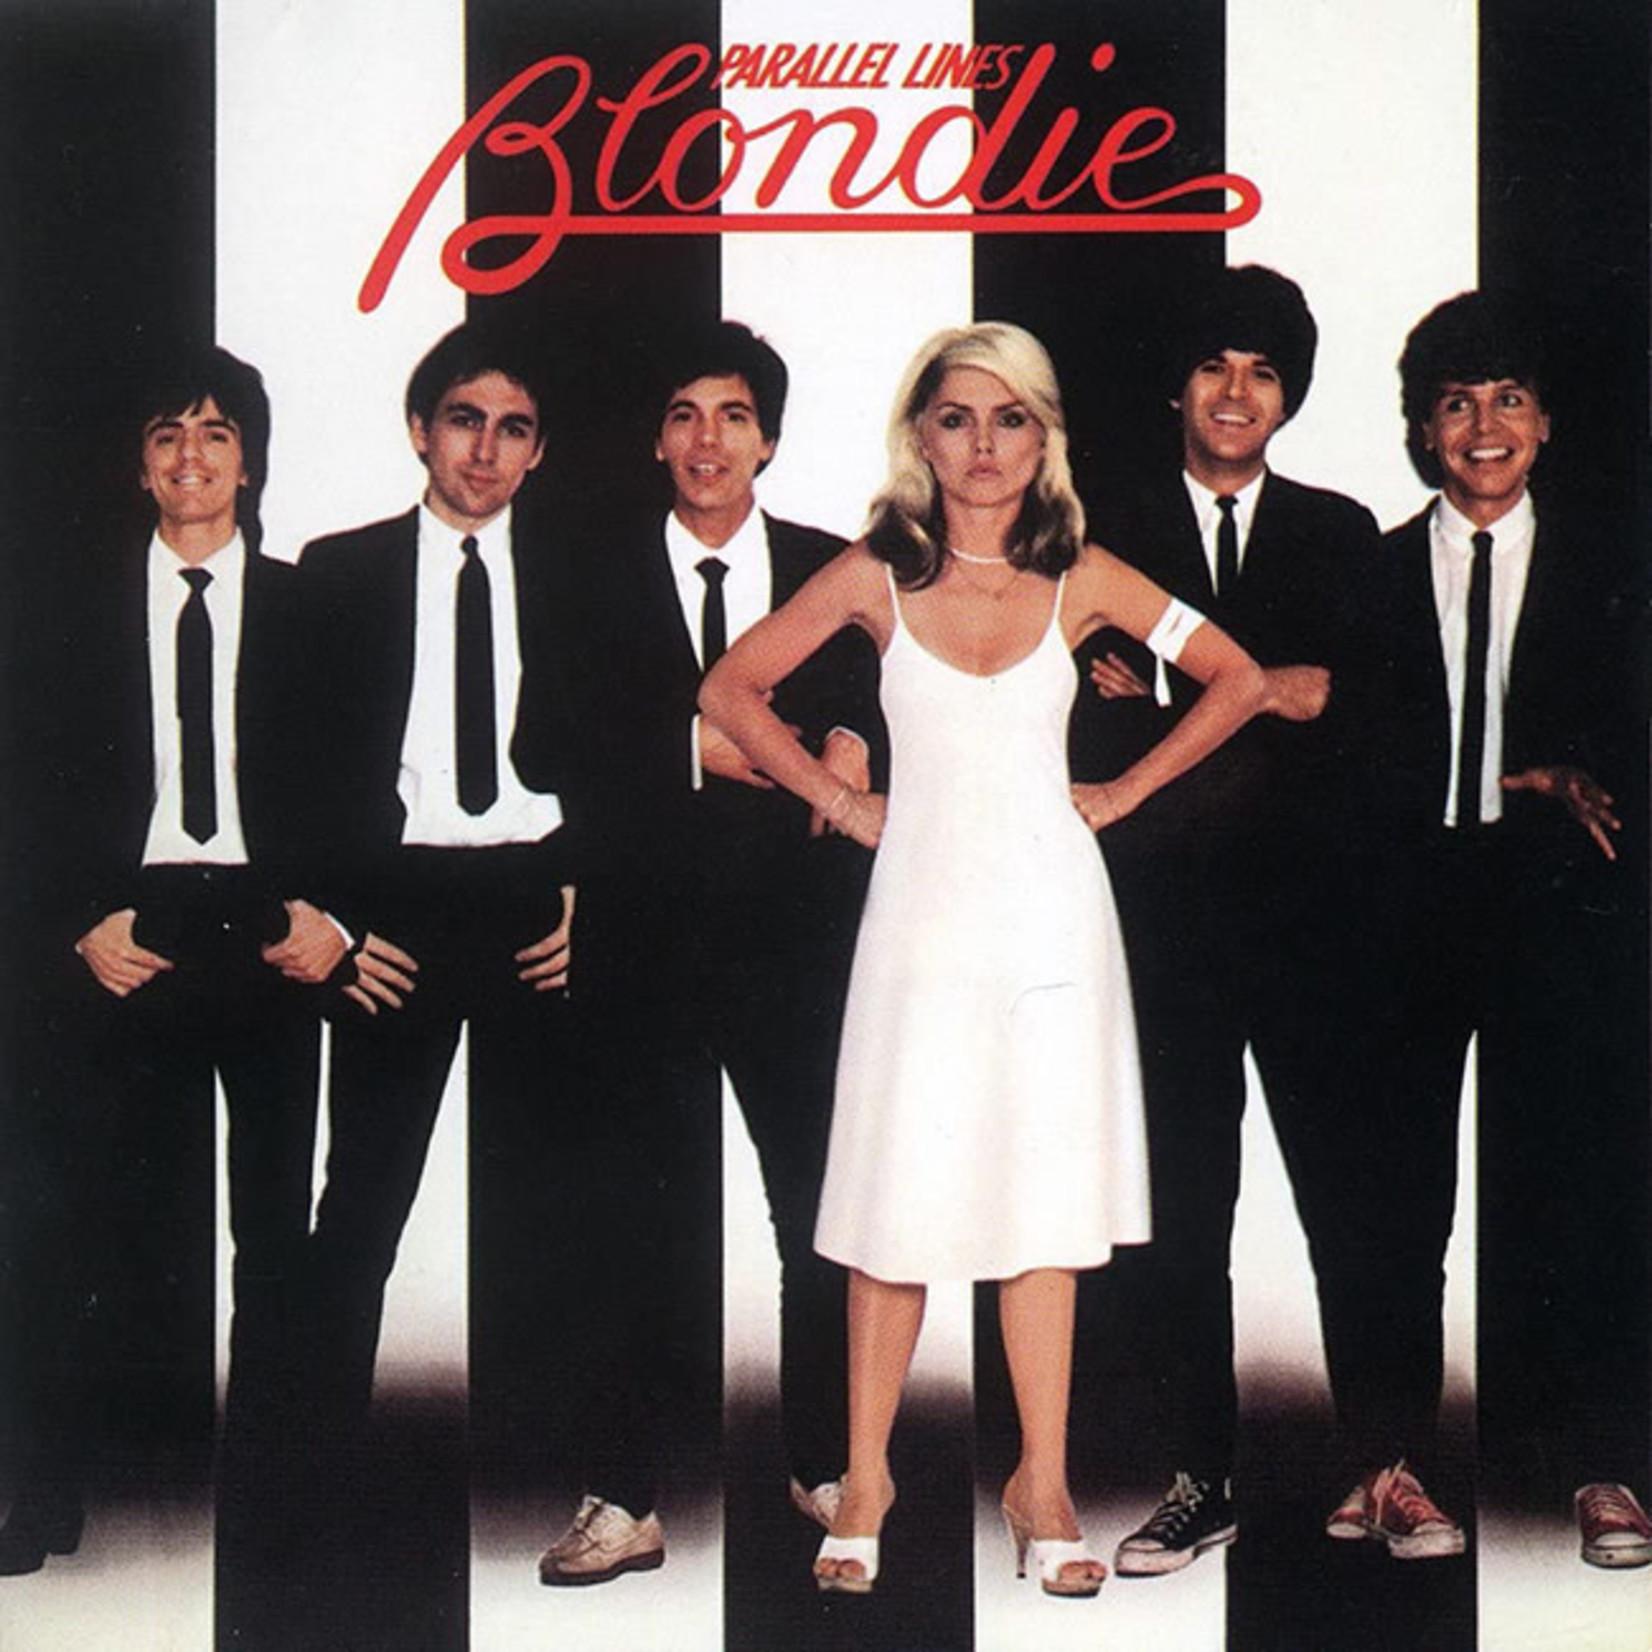 [New] Blondie: Parallel Lines